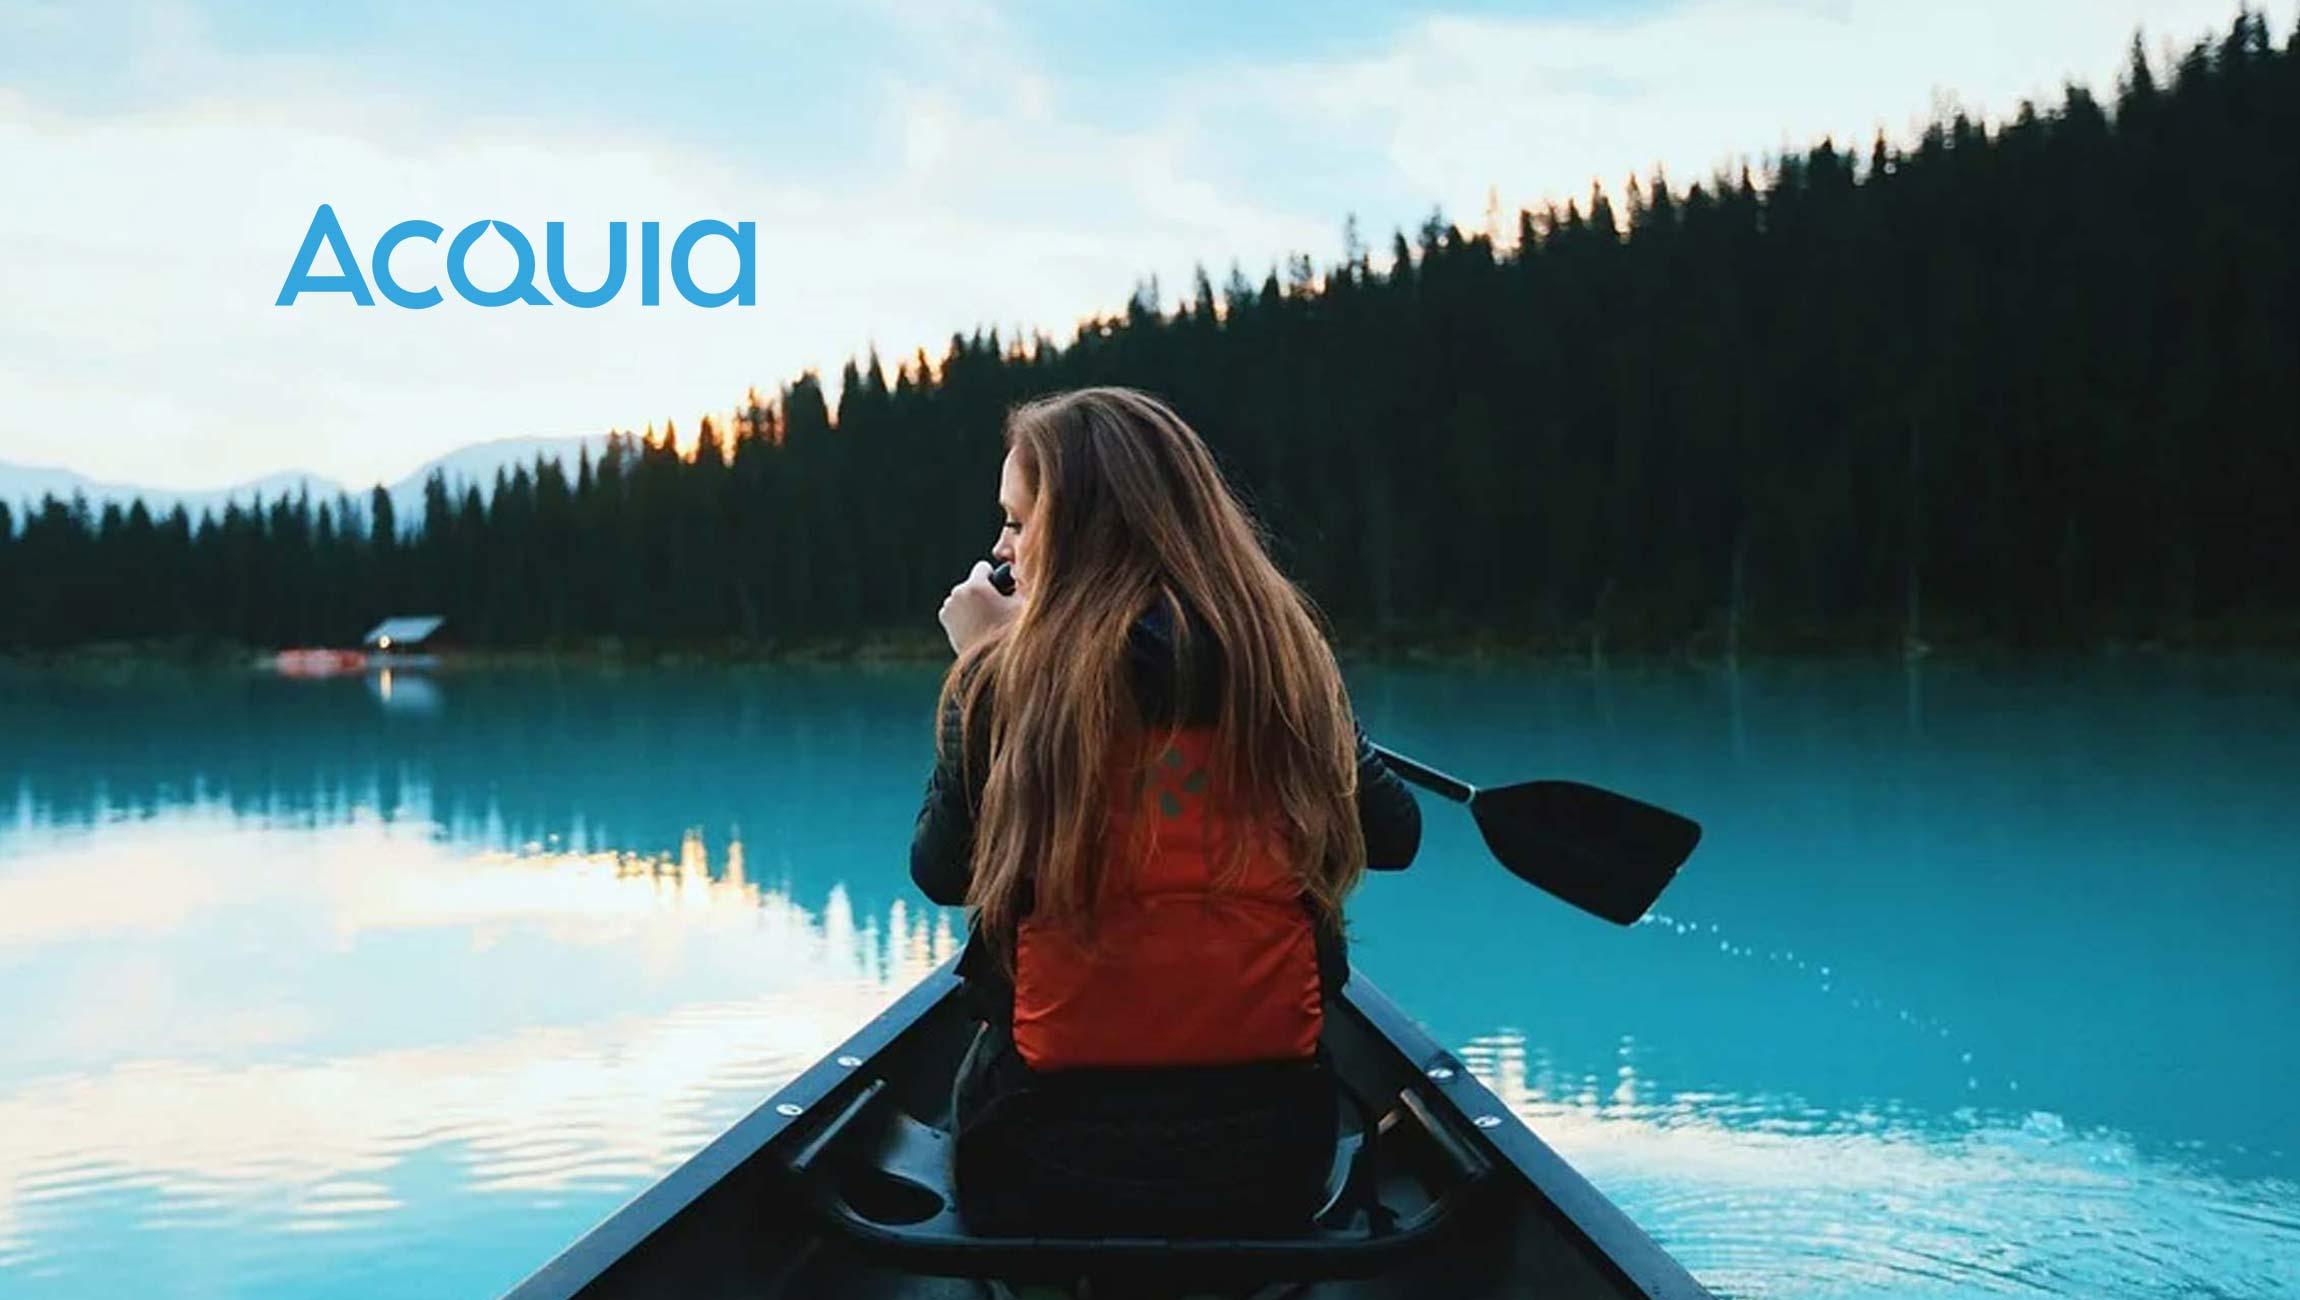 Acquia Digital Commerce Unifies Data, Content, Commerce, and Digital Merchandising 1